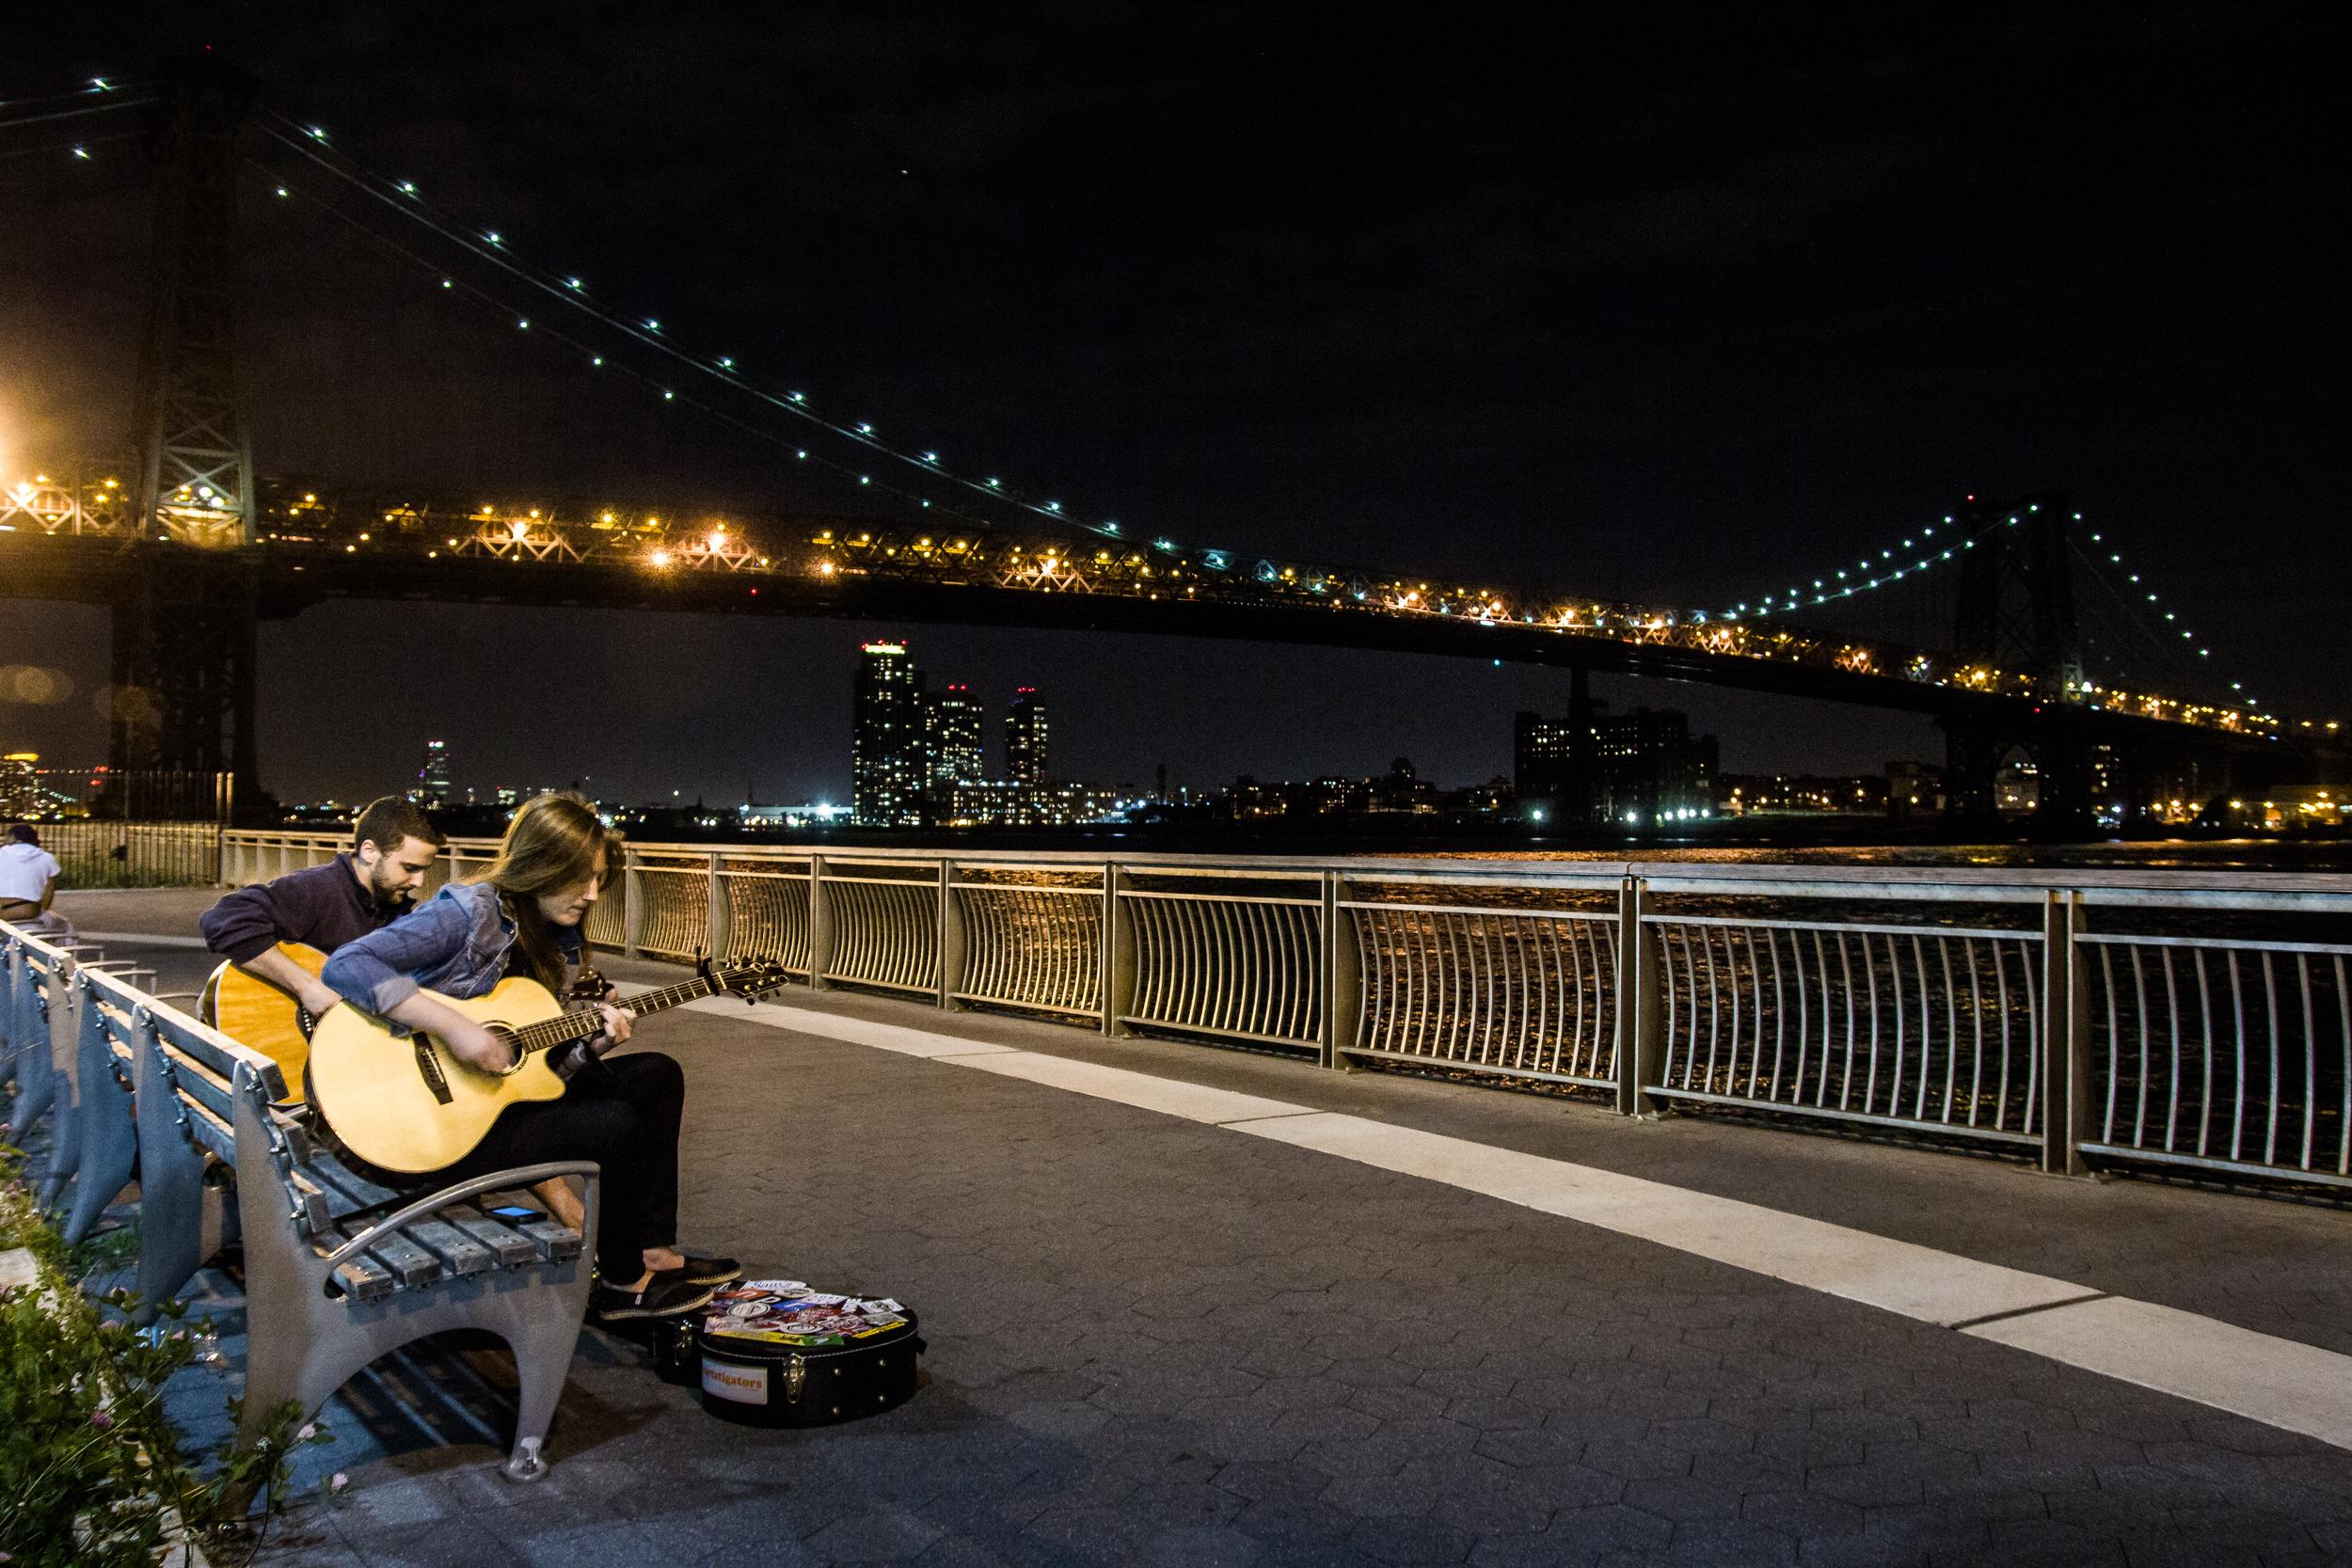 20150525 East River Night Shoot-3.jpg